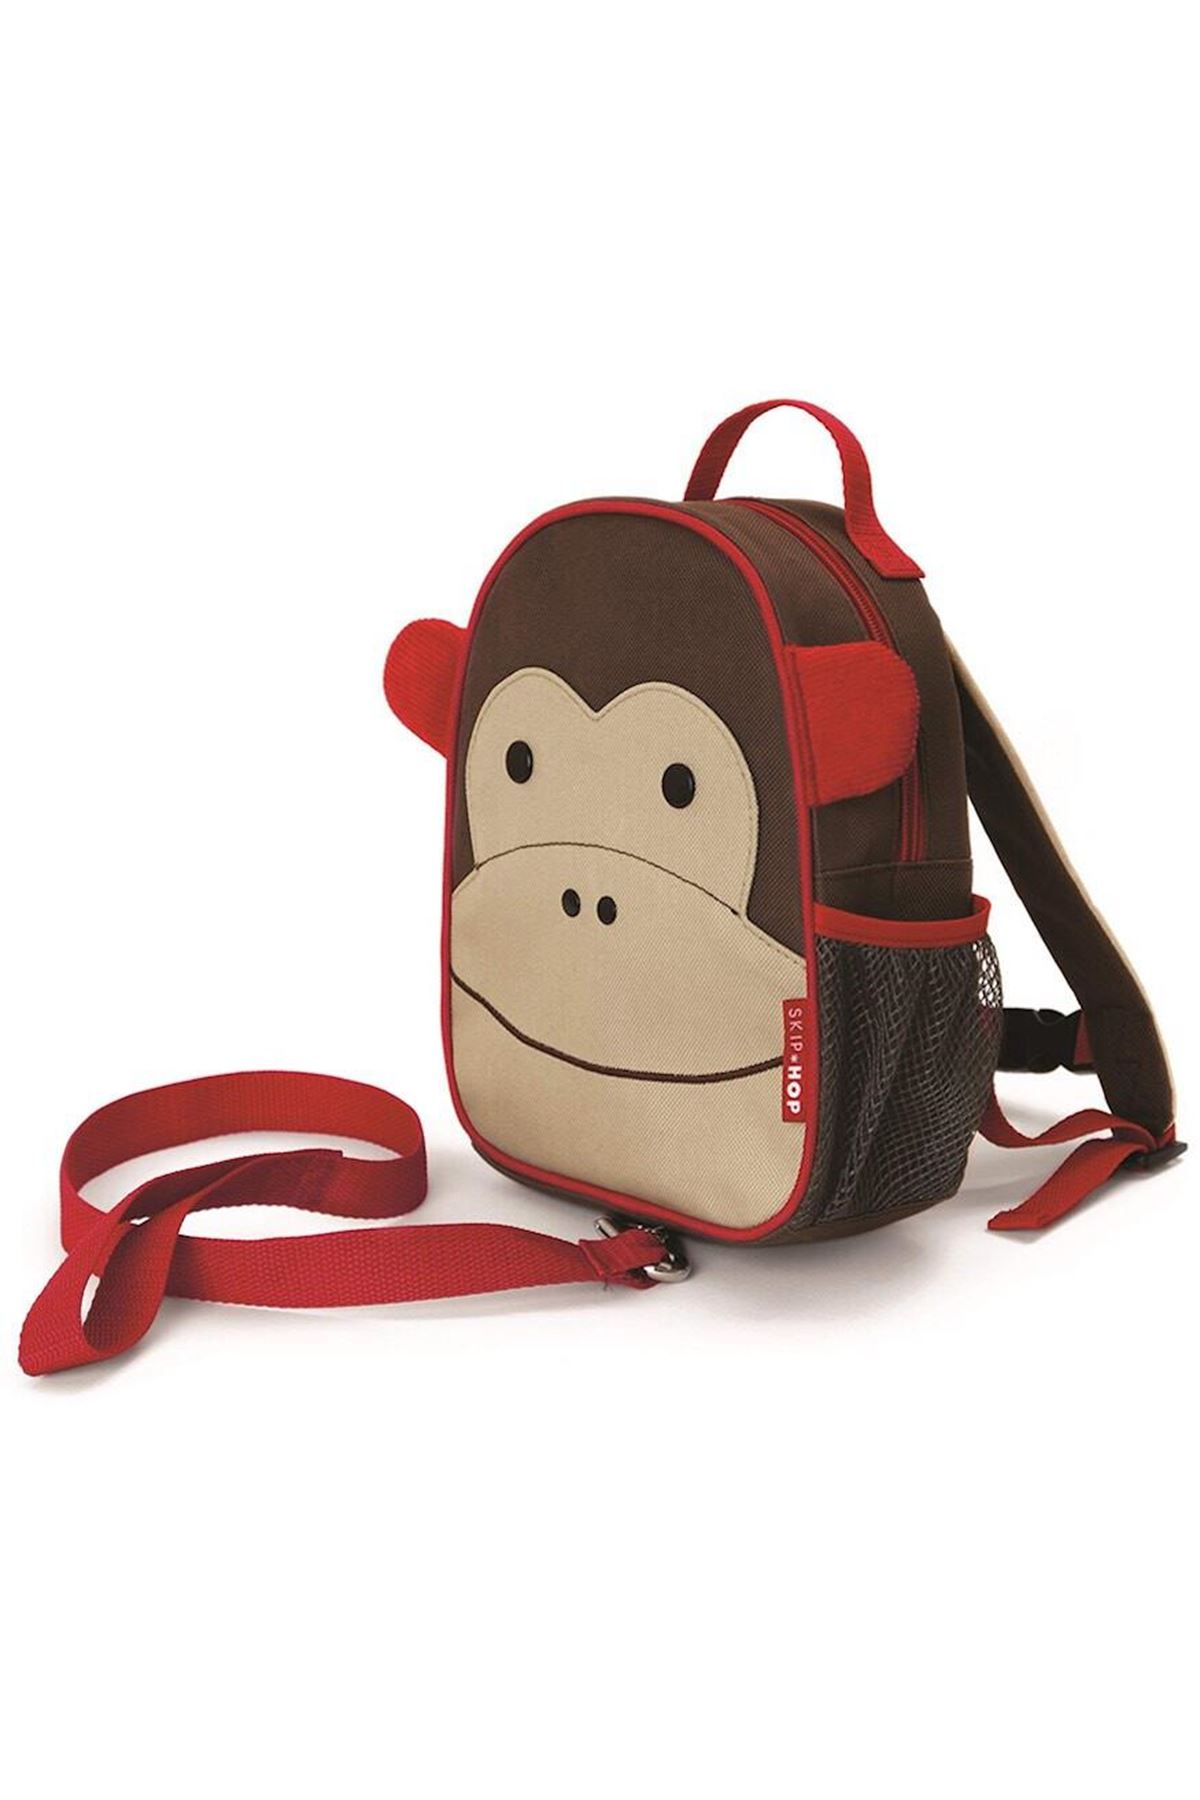 Skip Hop Zoo Emniyet Kemerli Sırt Çantası Maymun